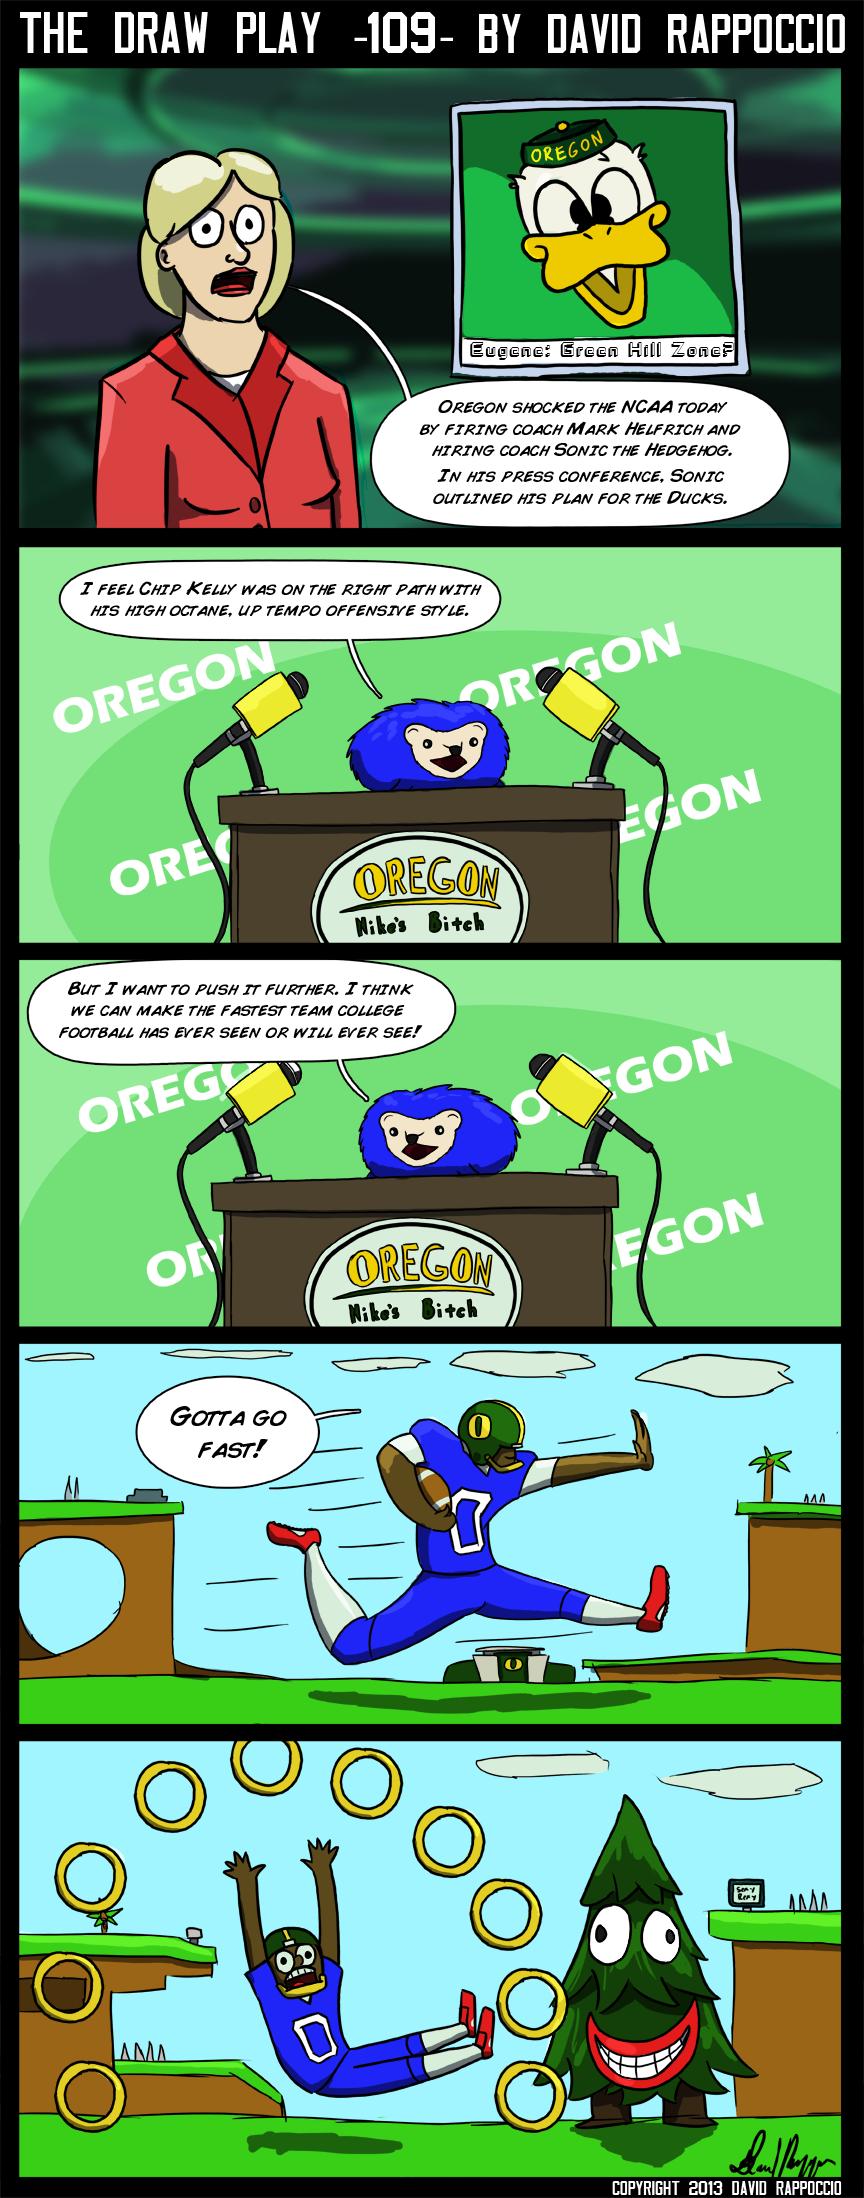 You got college in my NFL comic!